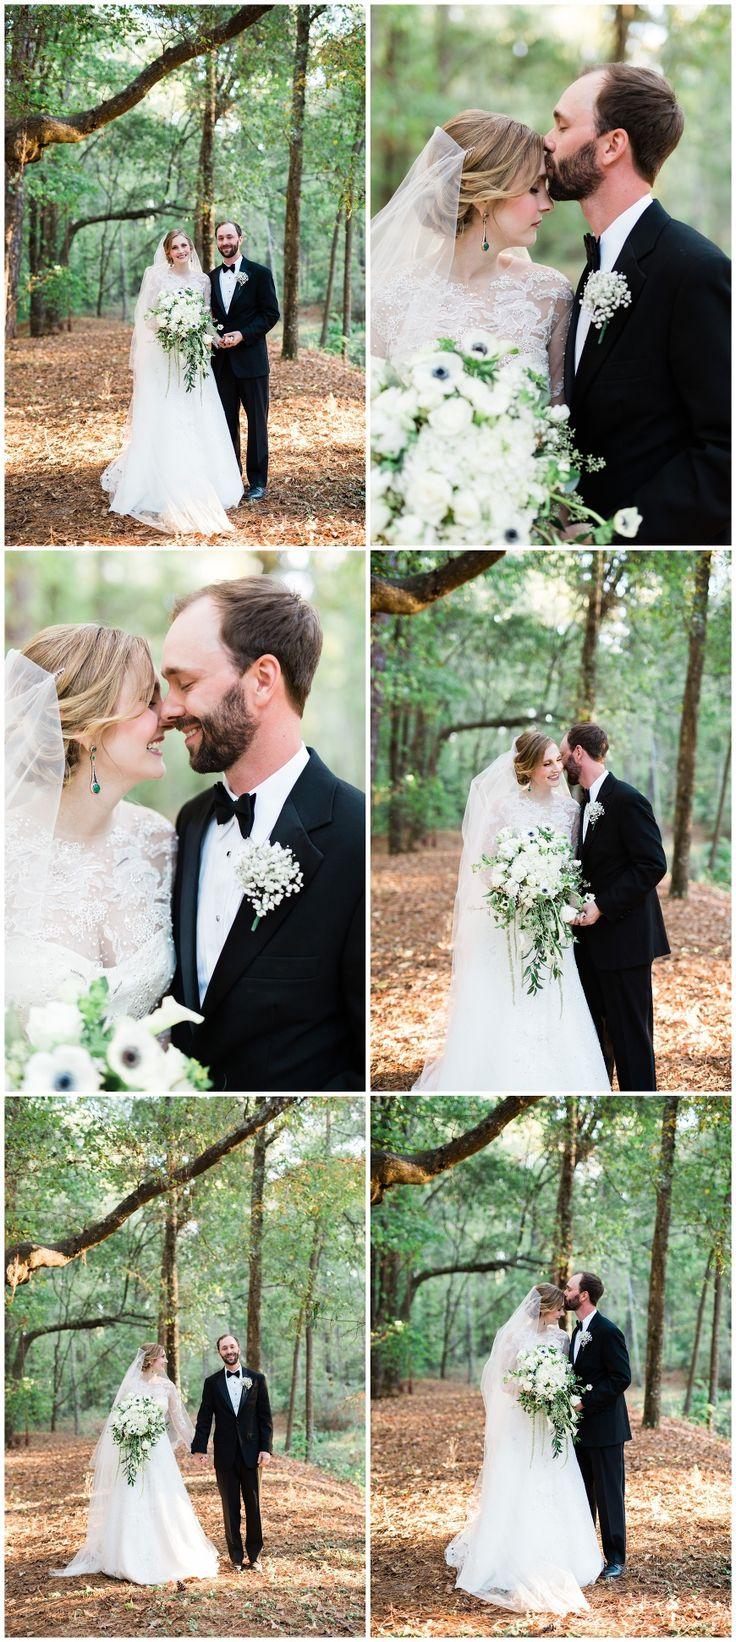 23 Best 2016 Weddings Images On Pinterest Destination